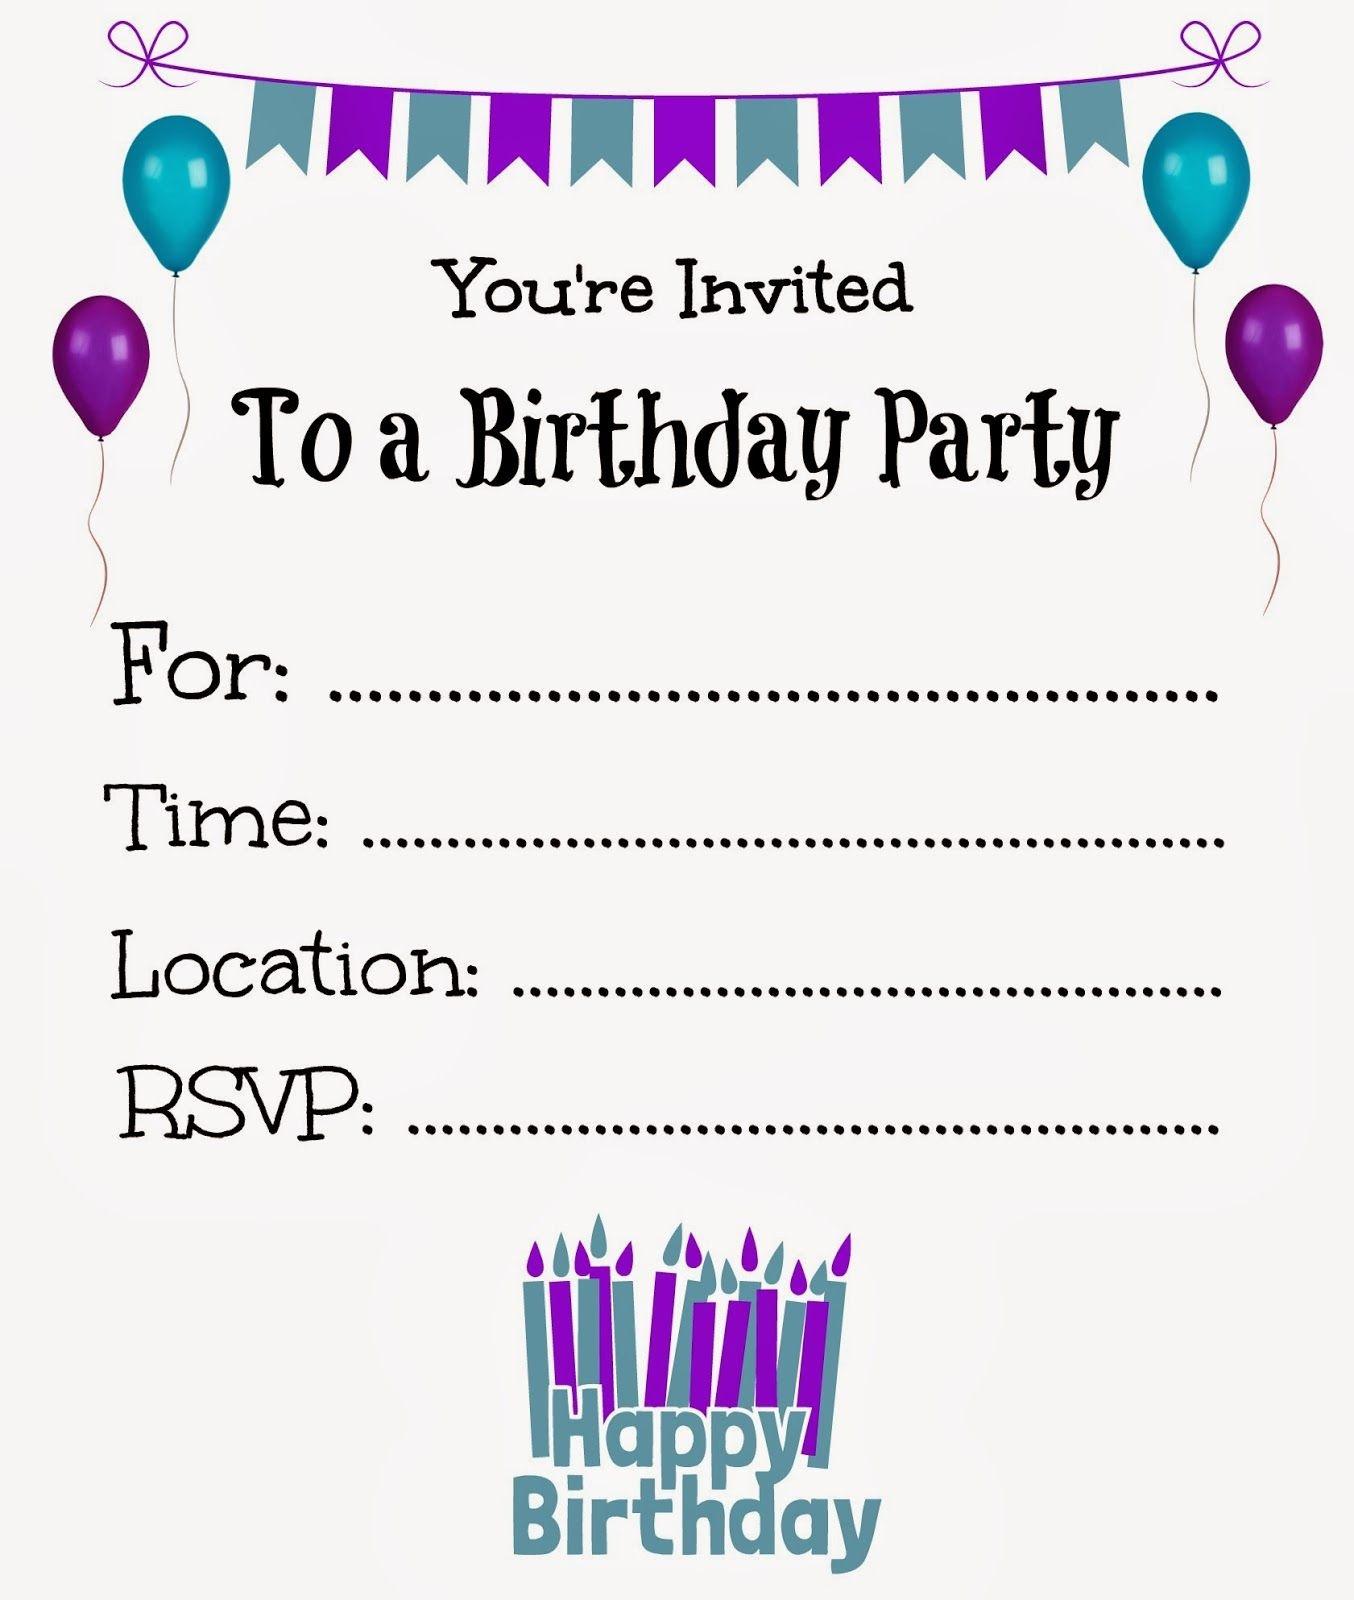 Free Printable Birthday Invitations For Kids #freeprintables - Free Online Printable Birthday Cards